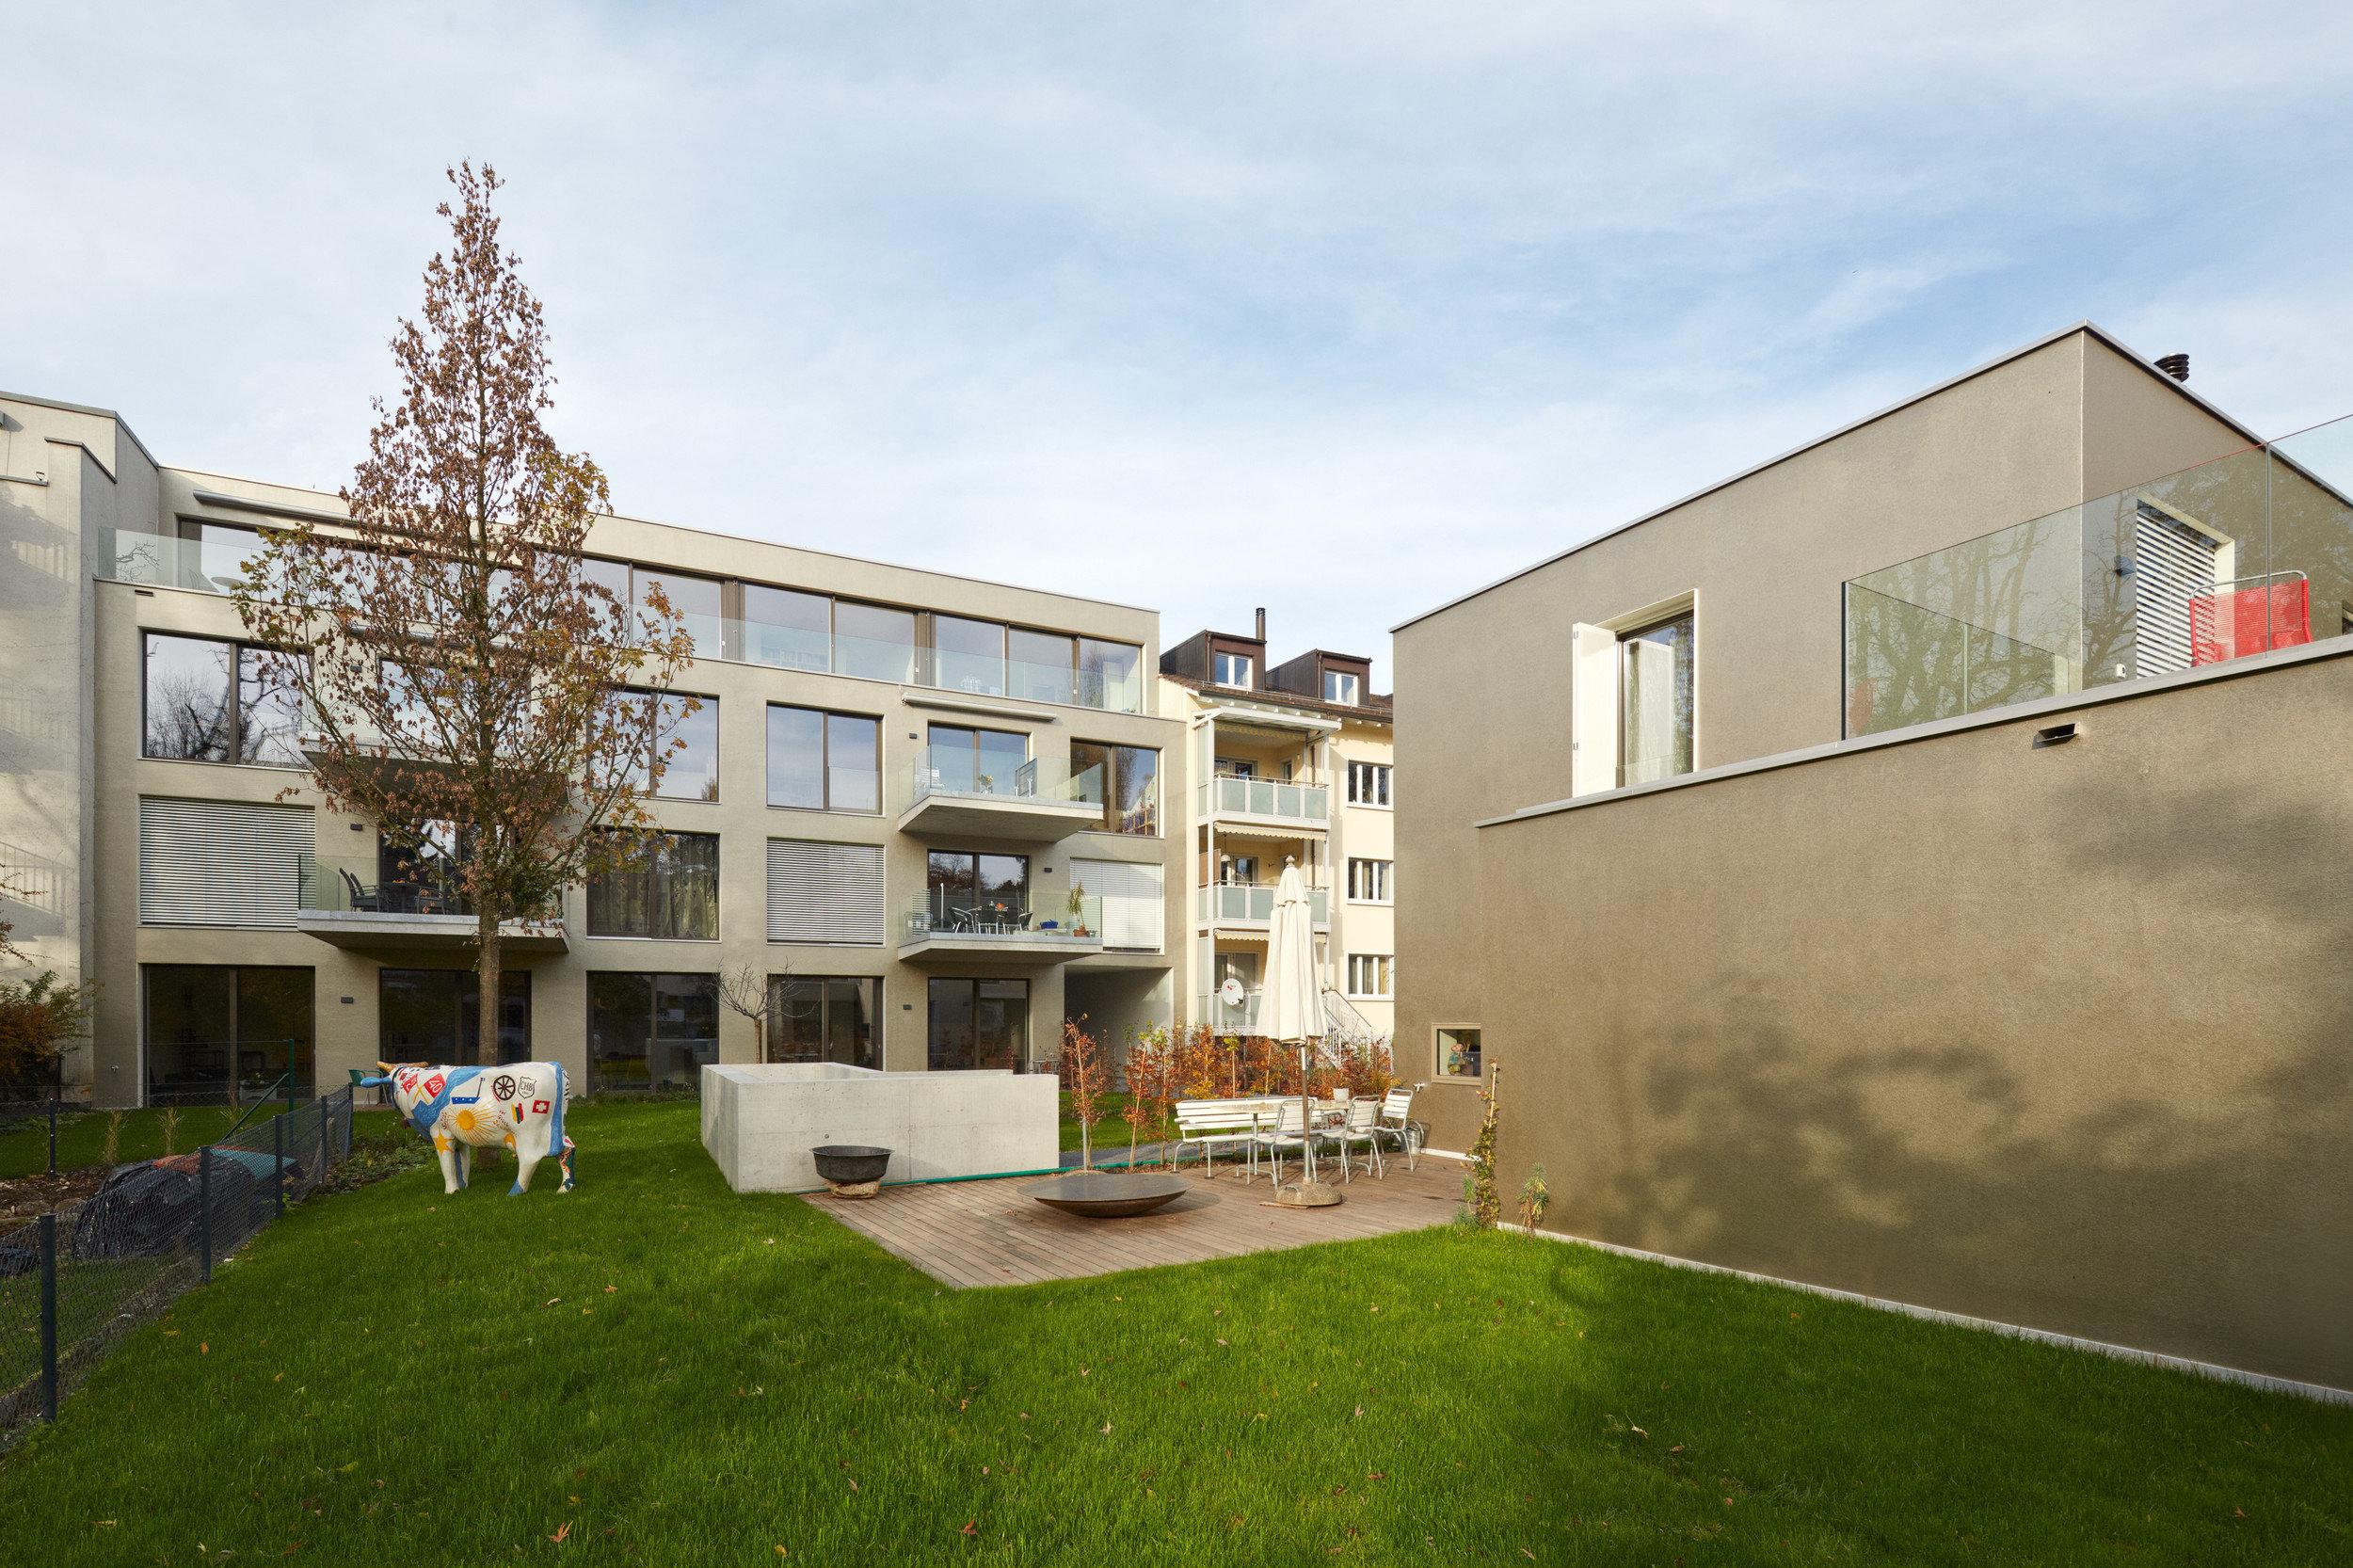 4-stöckiger Beton-Wohnblock hinter 2-stöckigem Beton-Wohnblock mit Grünfläche